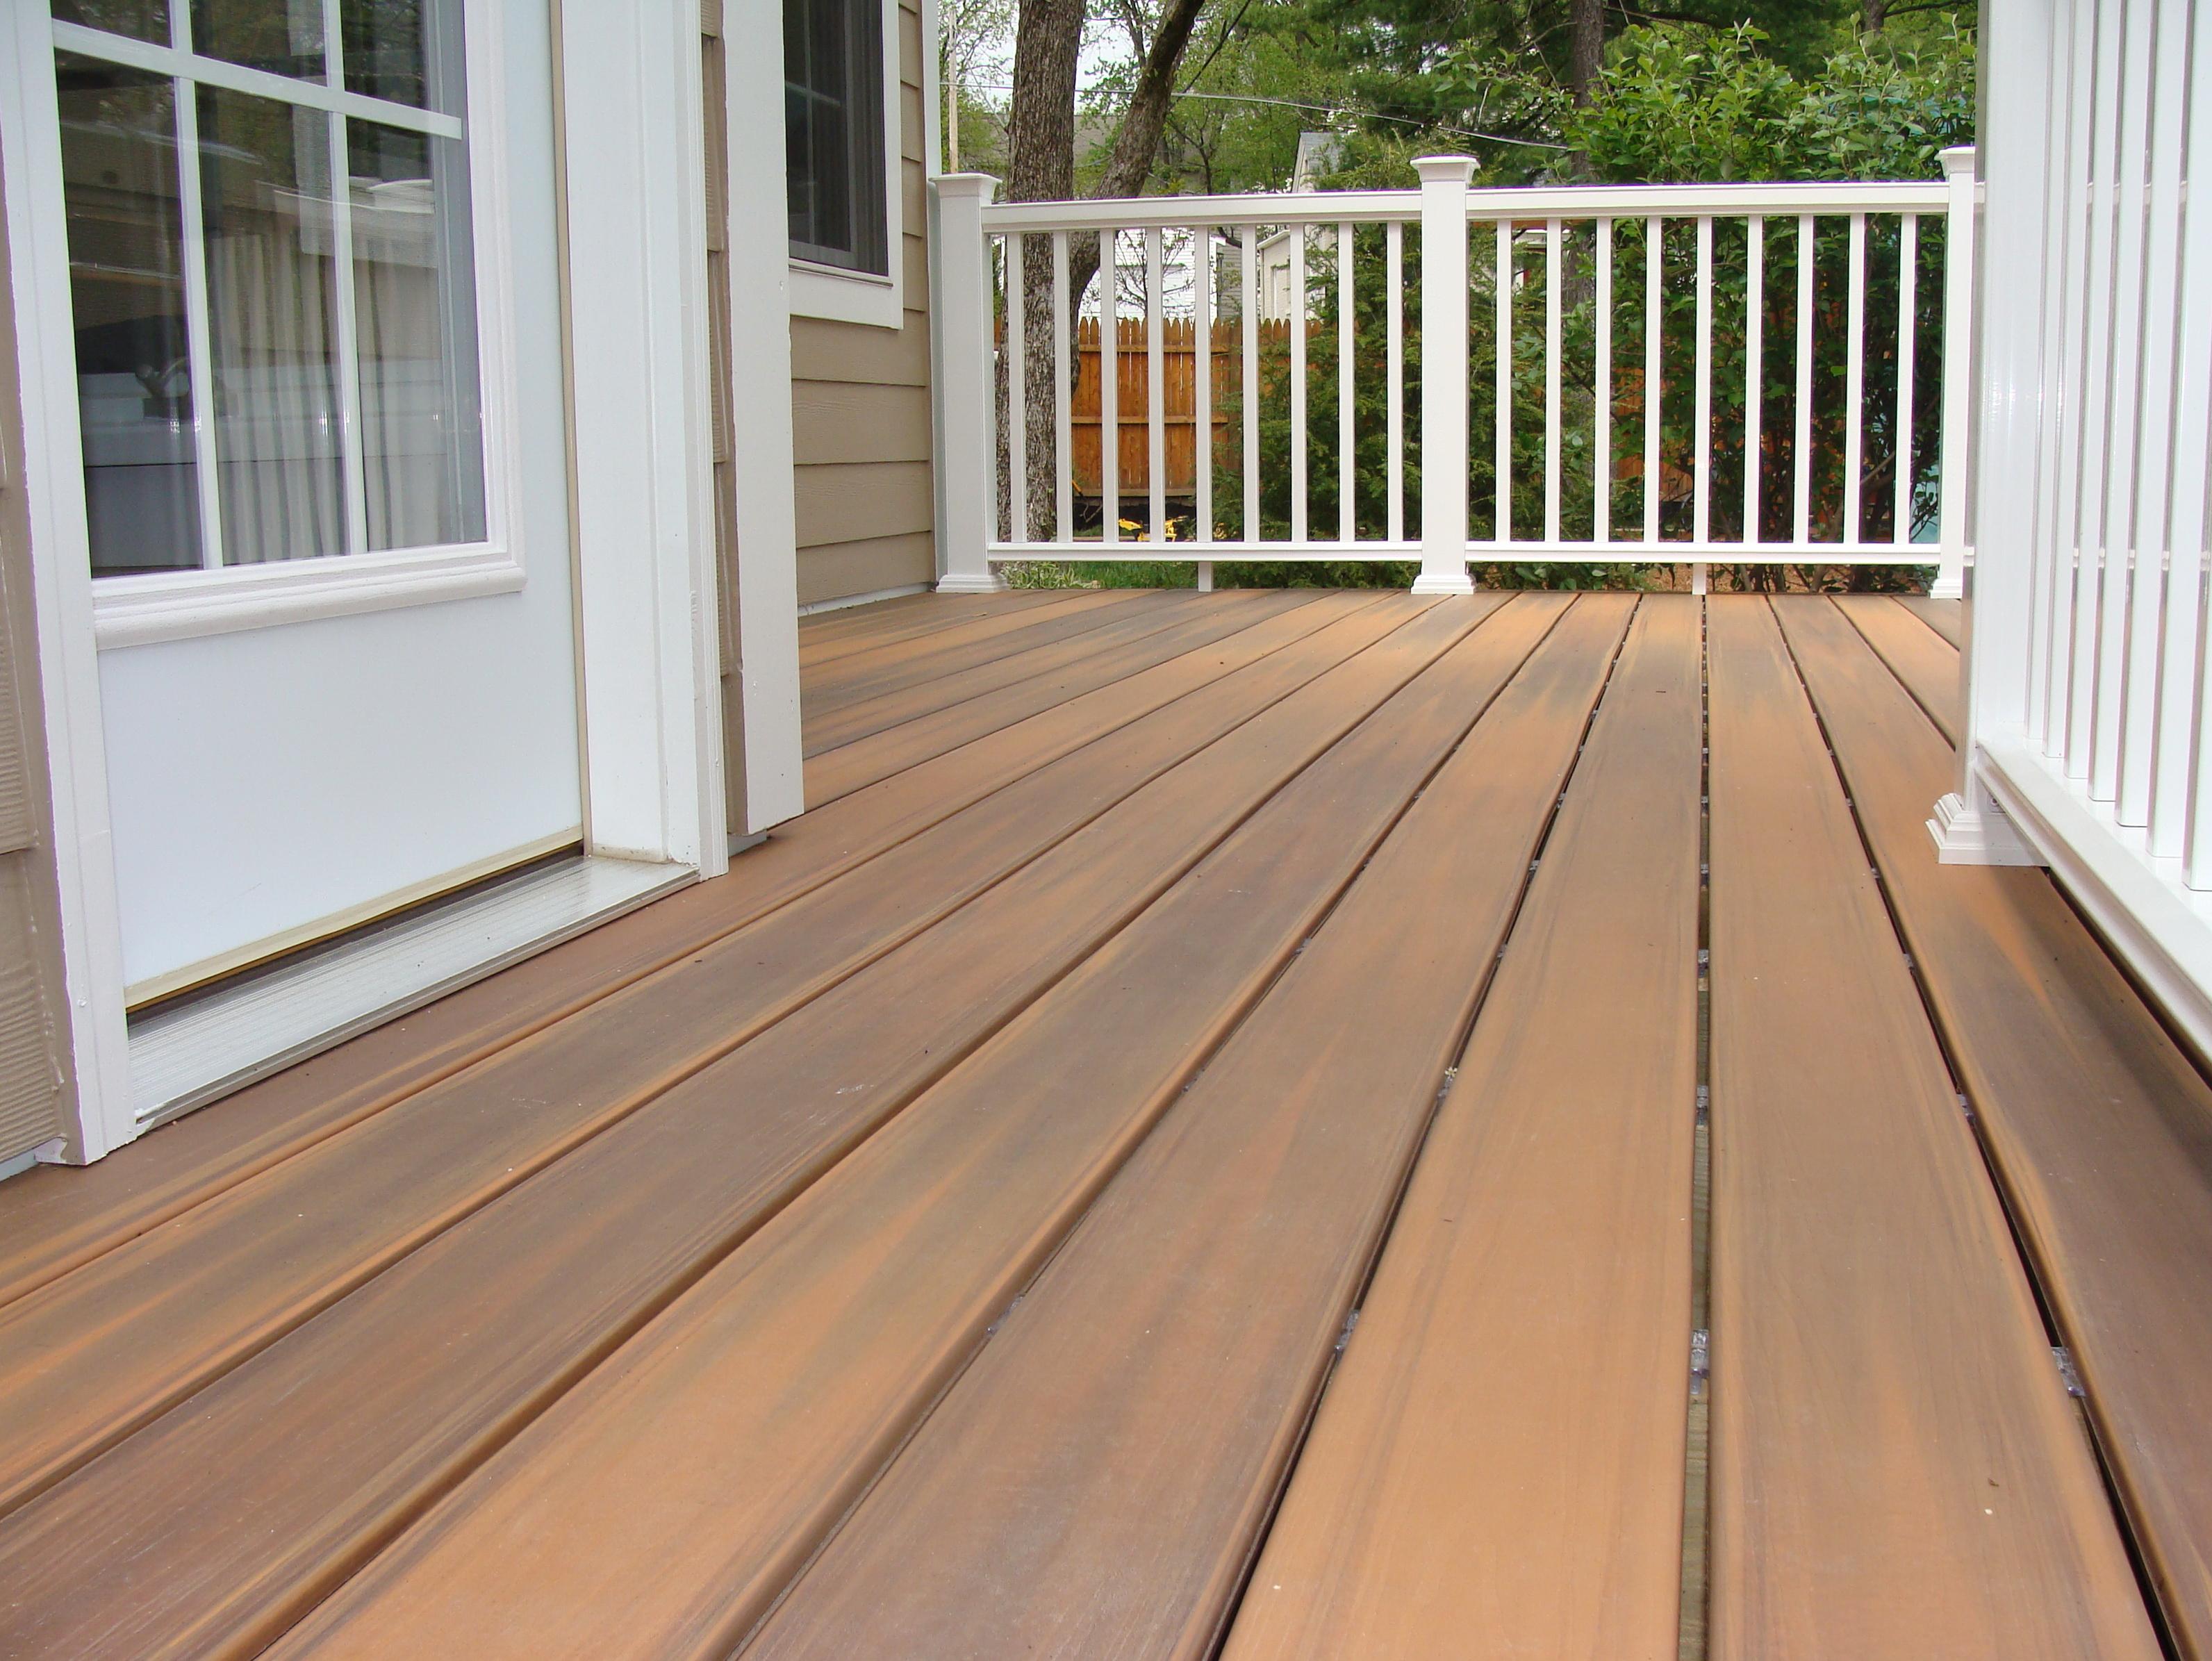 Azek composite decking colors home design ideas for Colors of composite decking